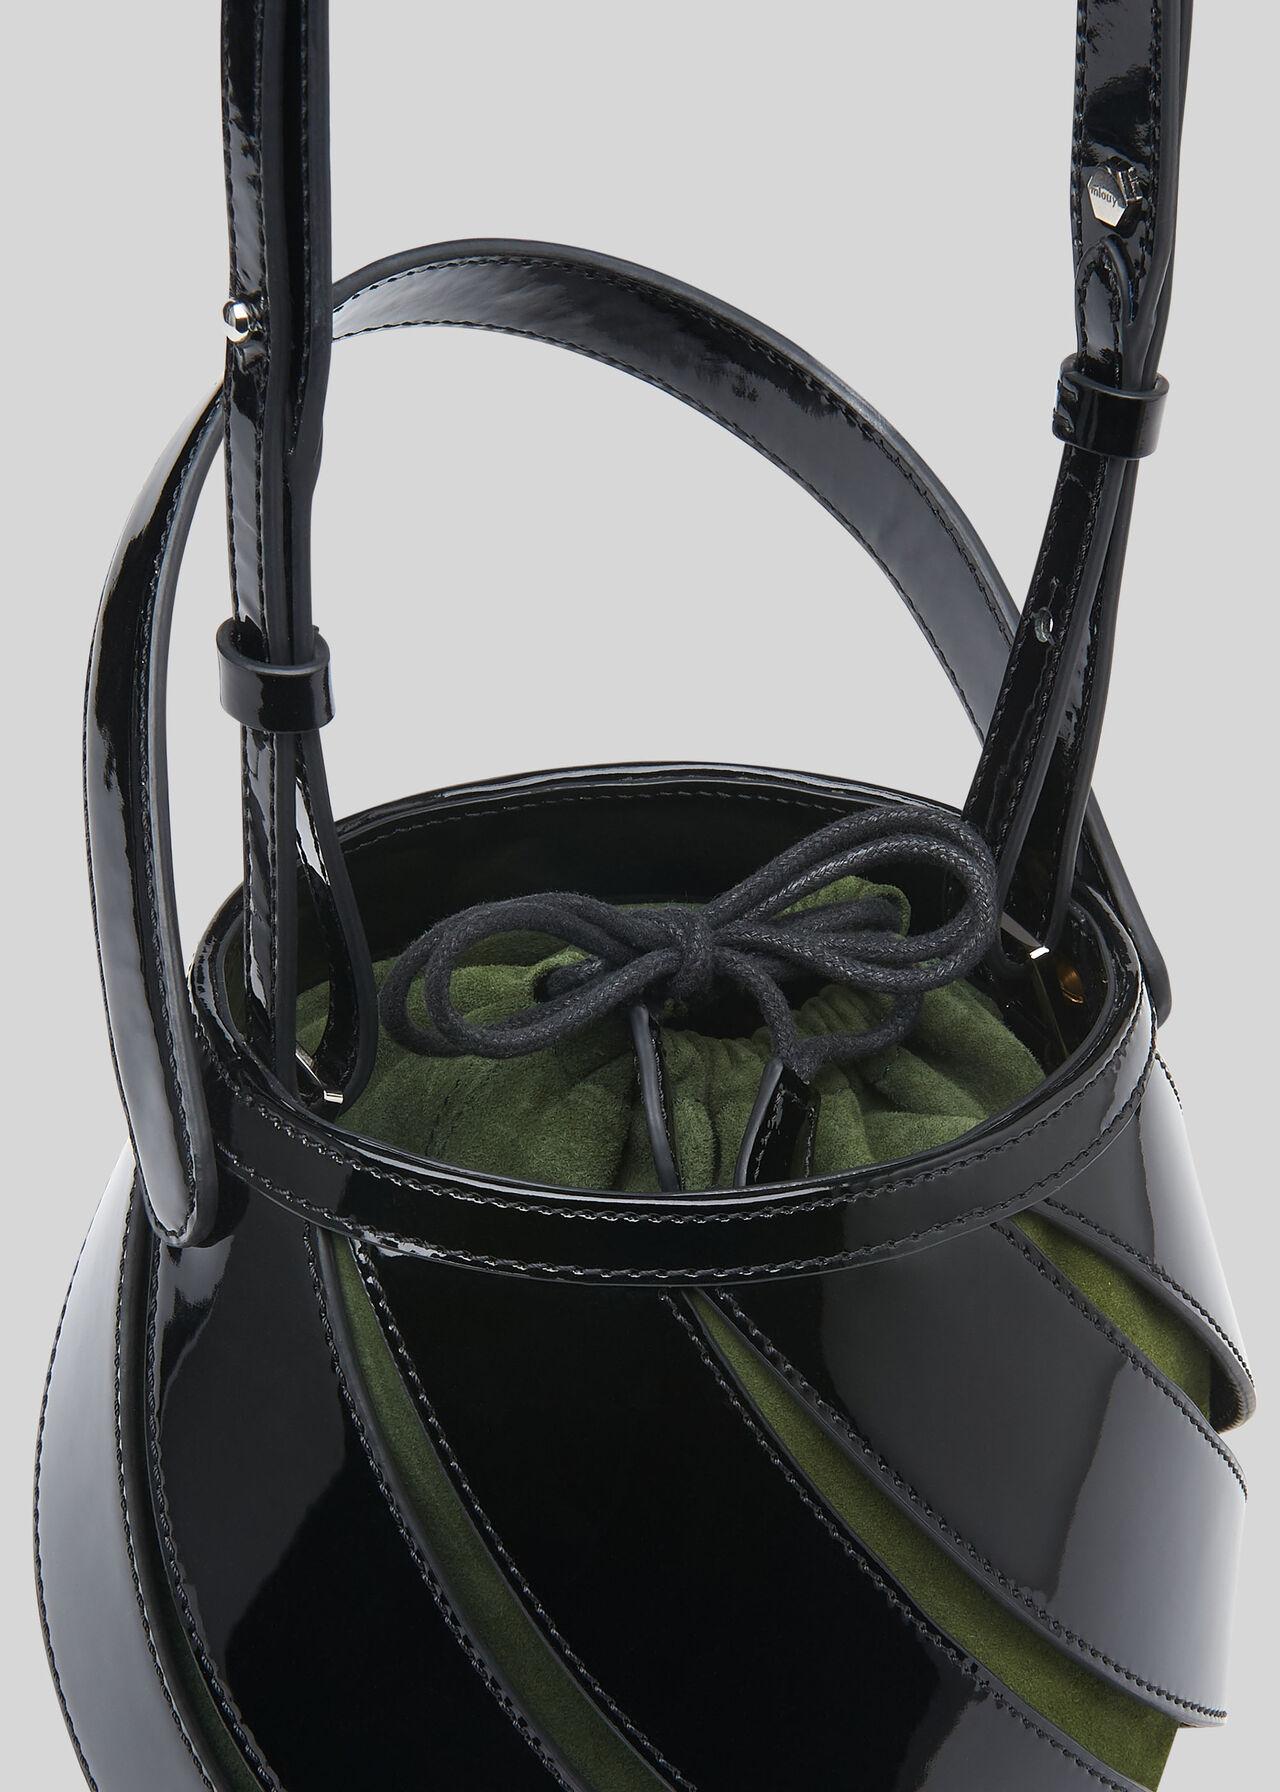 Whistles x Mlouye Helix Bag Black